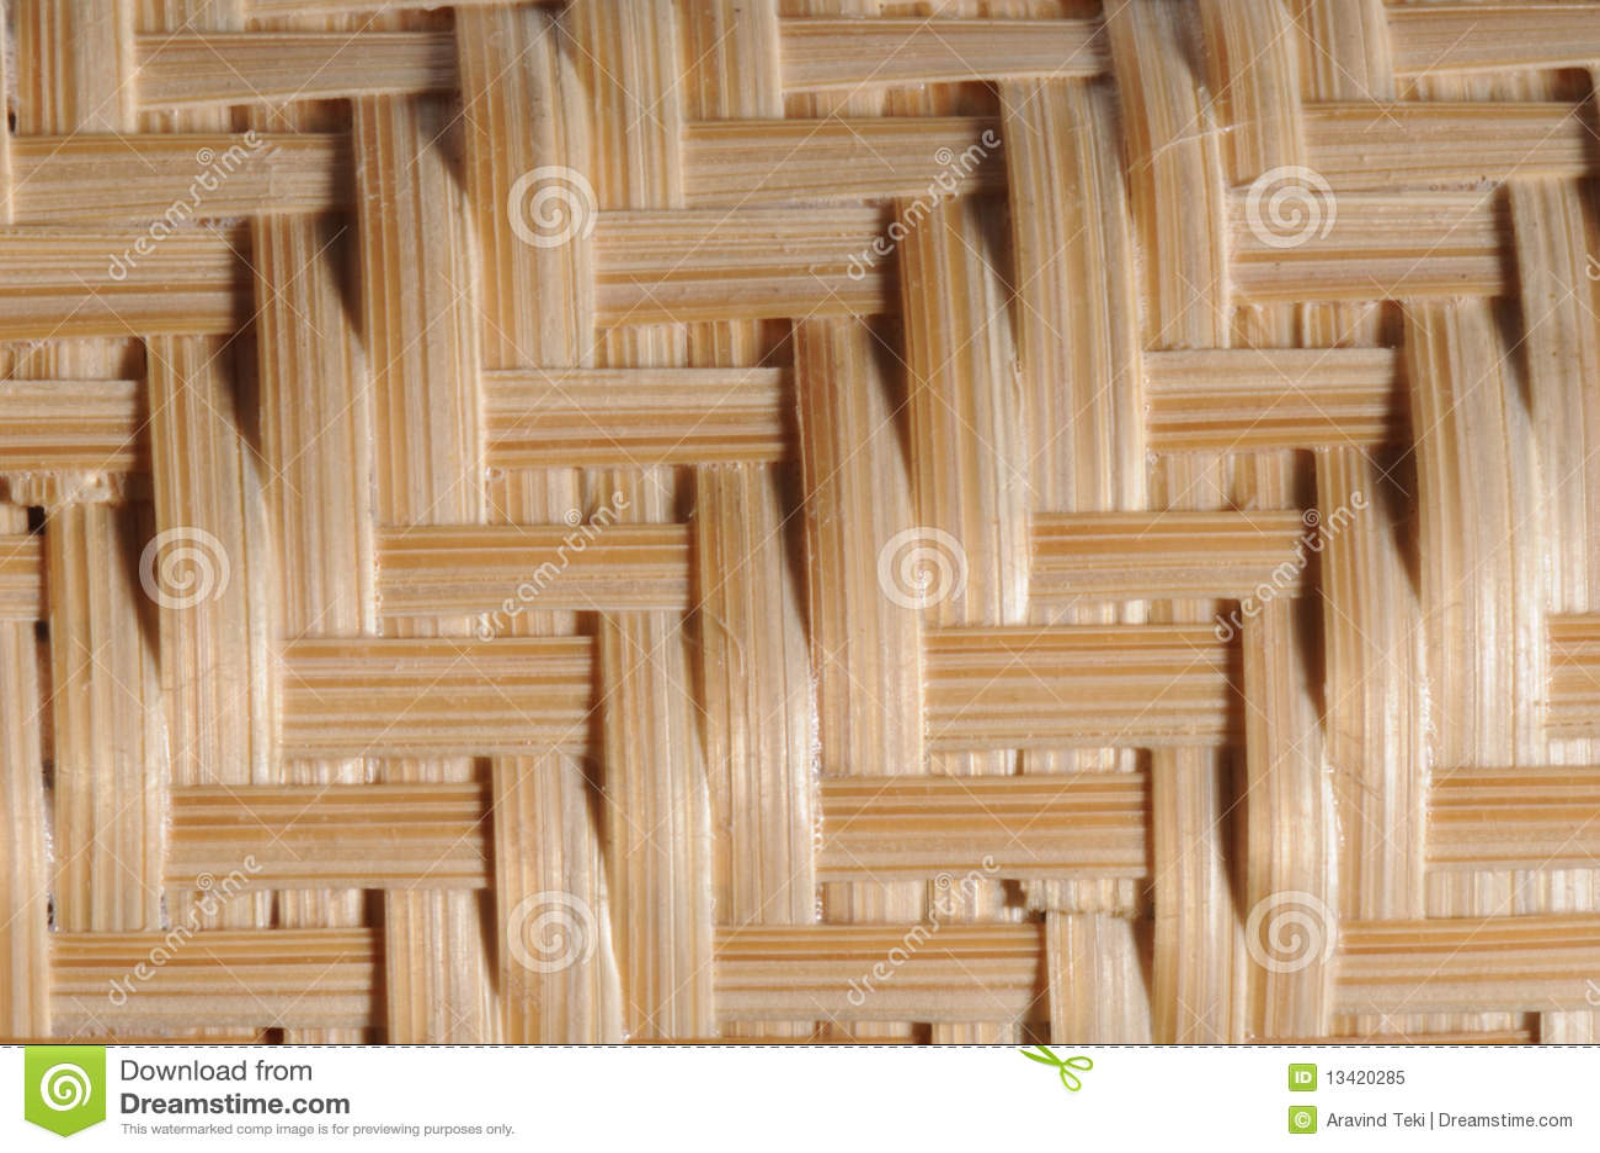 Bamboo Craft Royalty Free Stock Photo - Image: 13420285